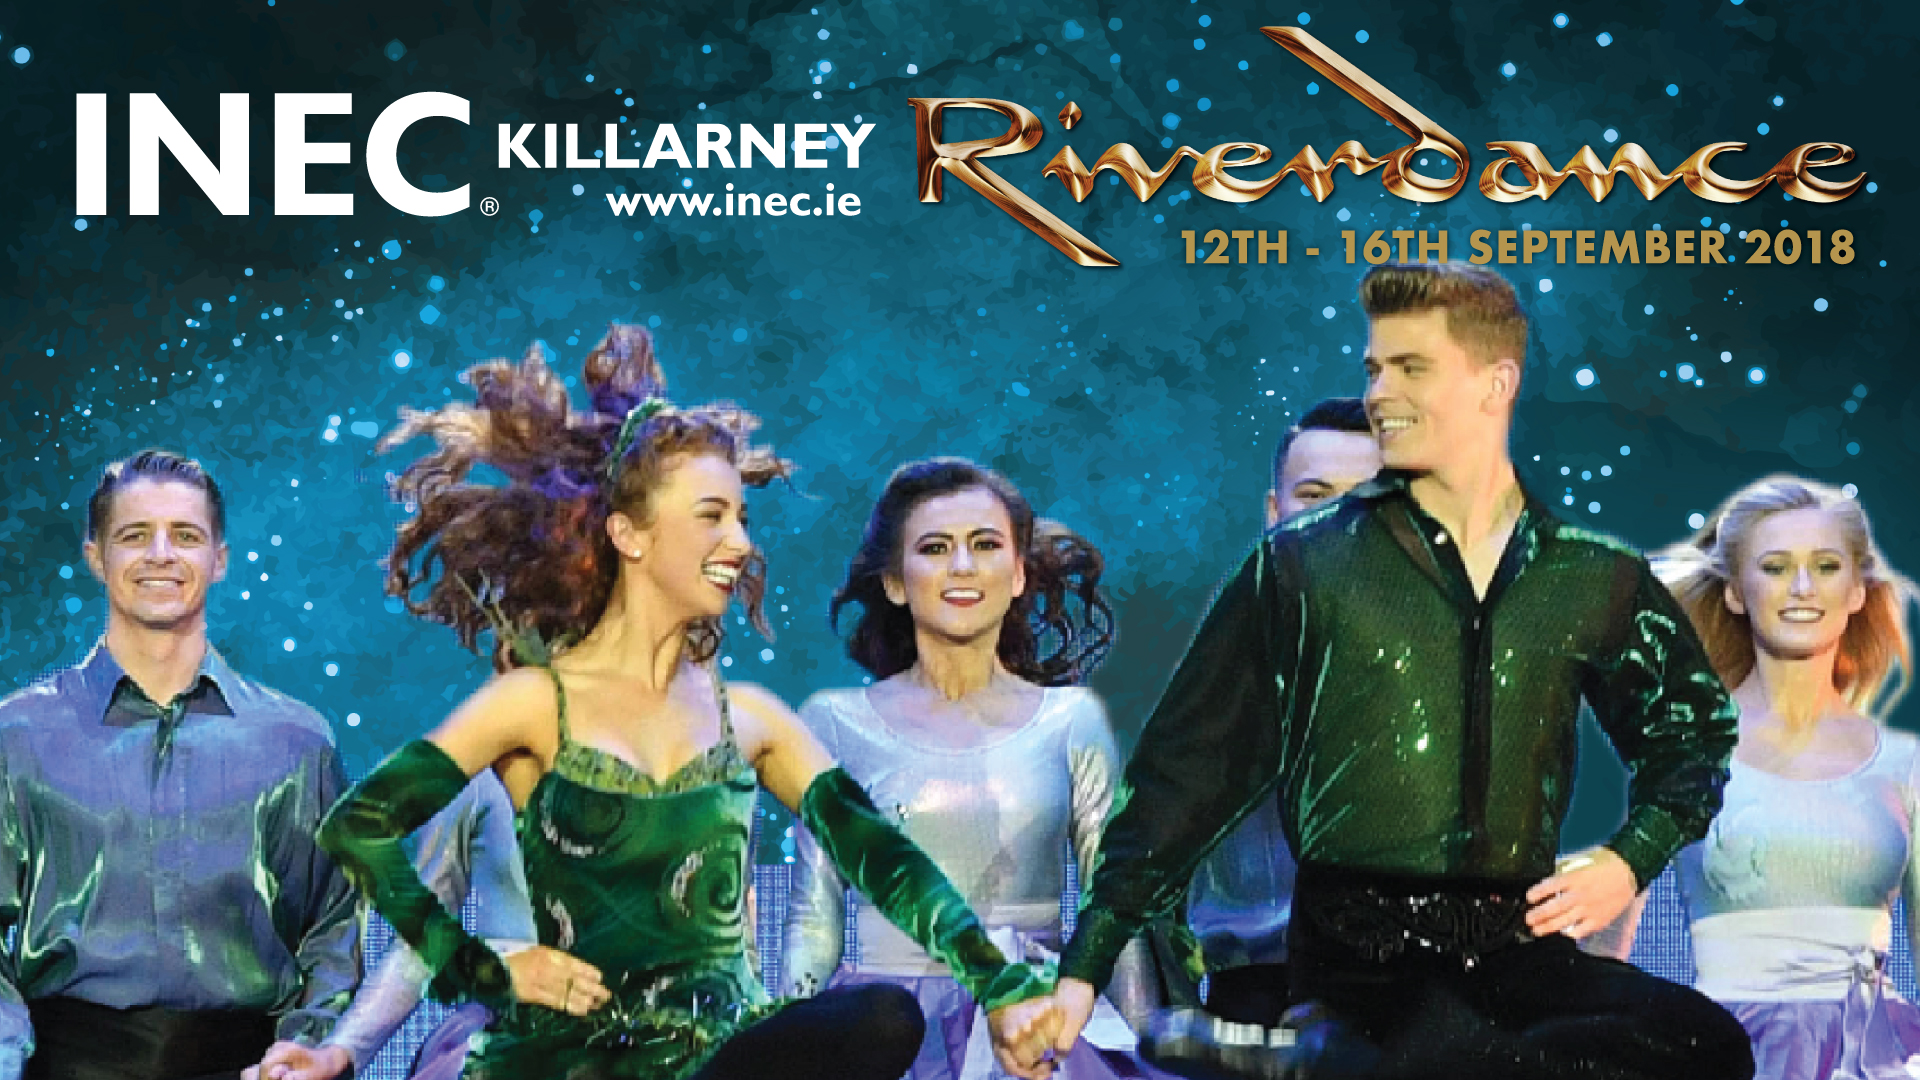 The international Irish Dancing phenomenon Riverdance returns to the INEC Killarney from 12th - 16th September 2018